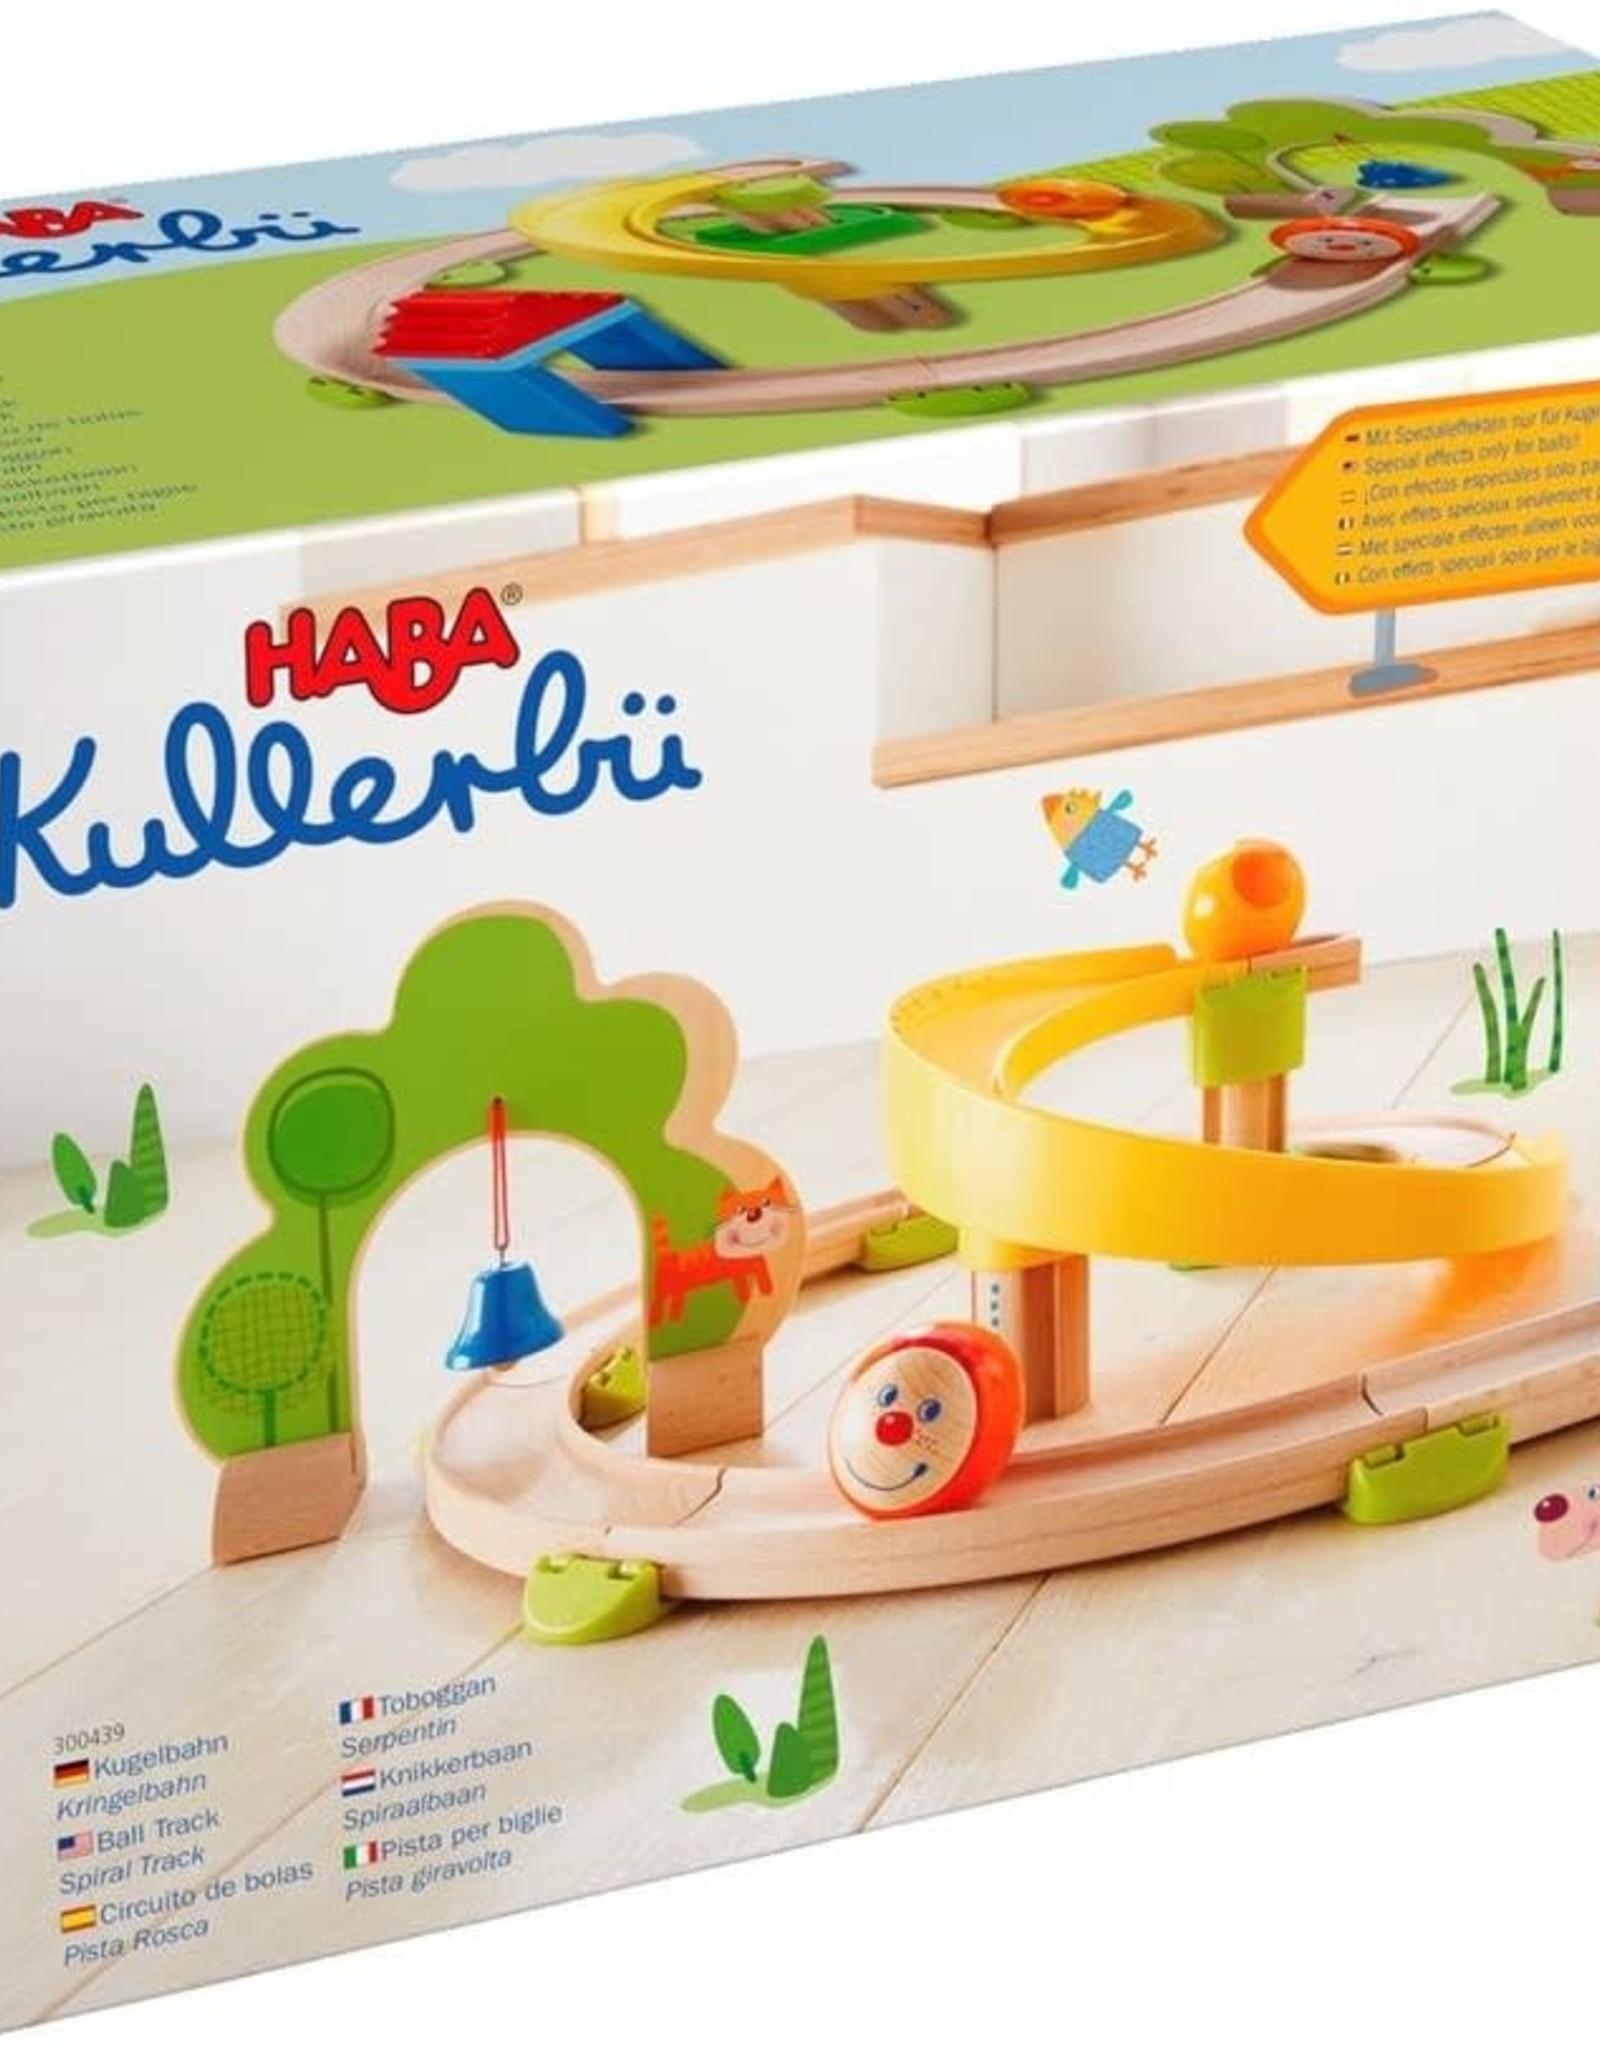 Haba Kullerbu Ball Track Spiral Track